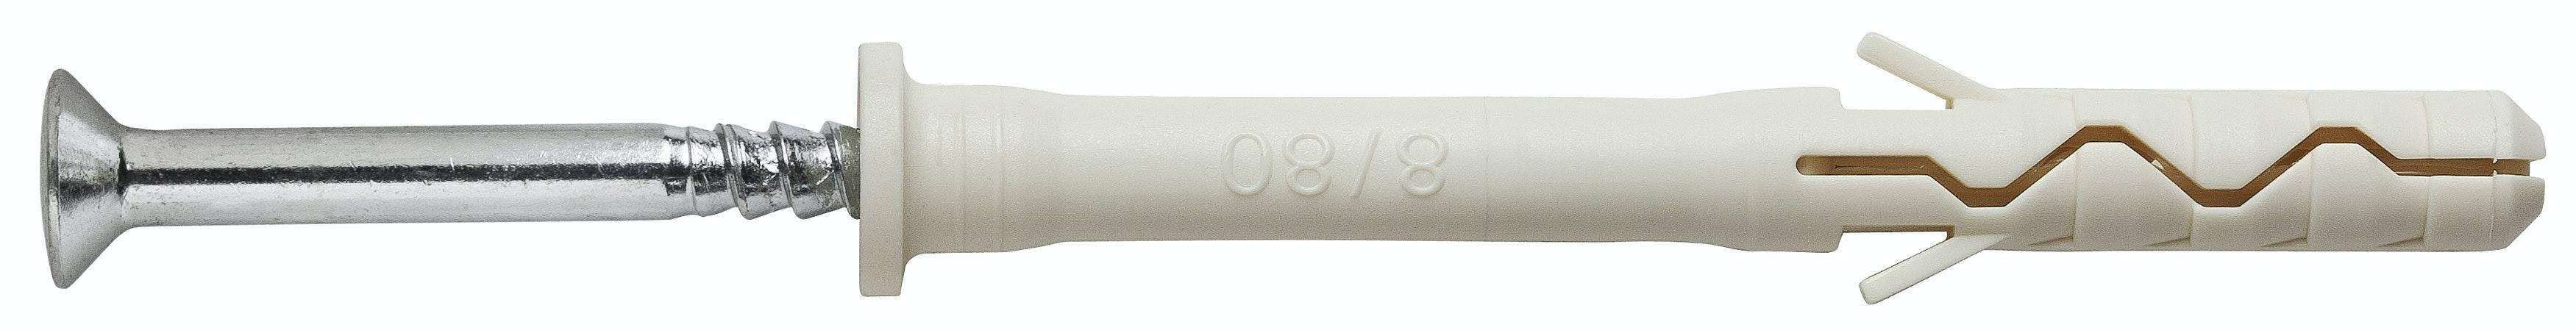 Fasadplugg Sormat S-UF 10X100 hex S95338 4/PÅSE